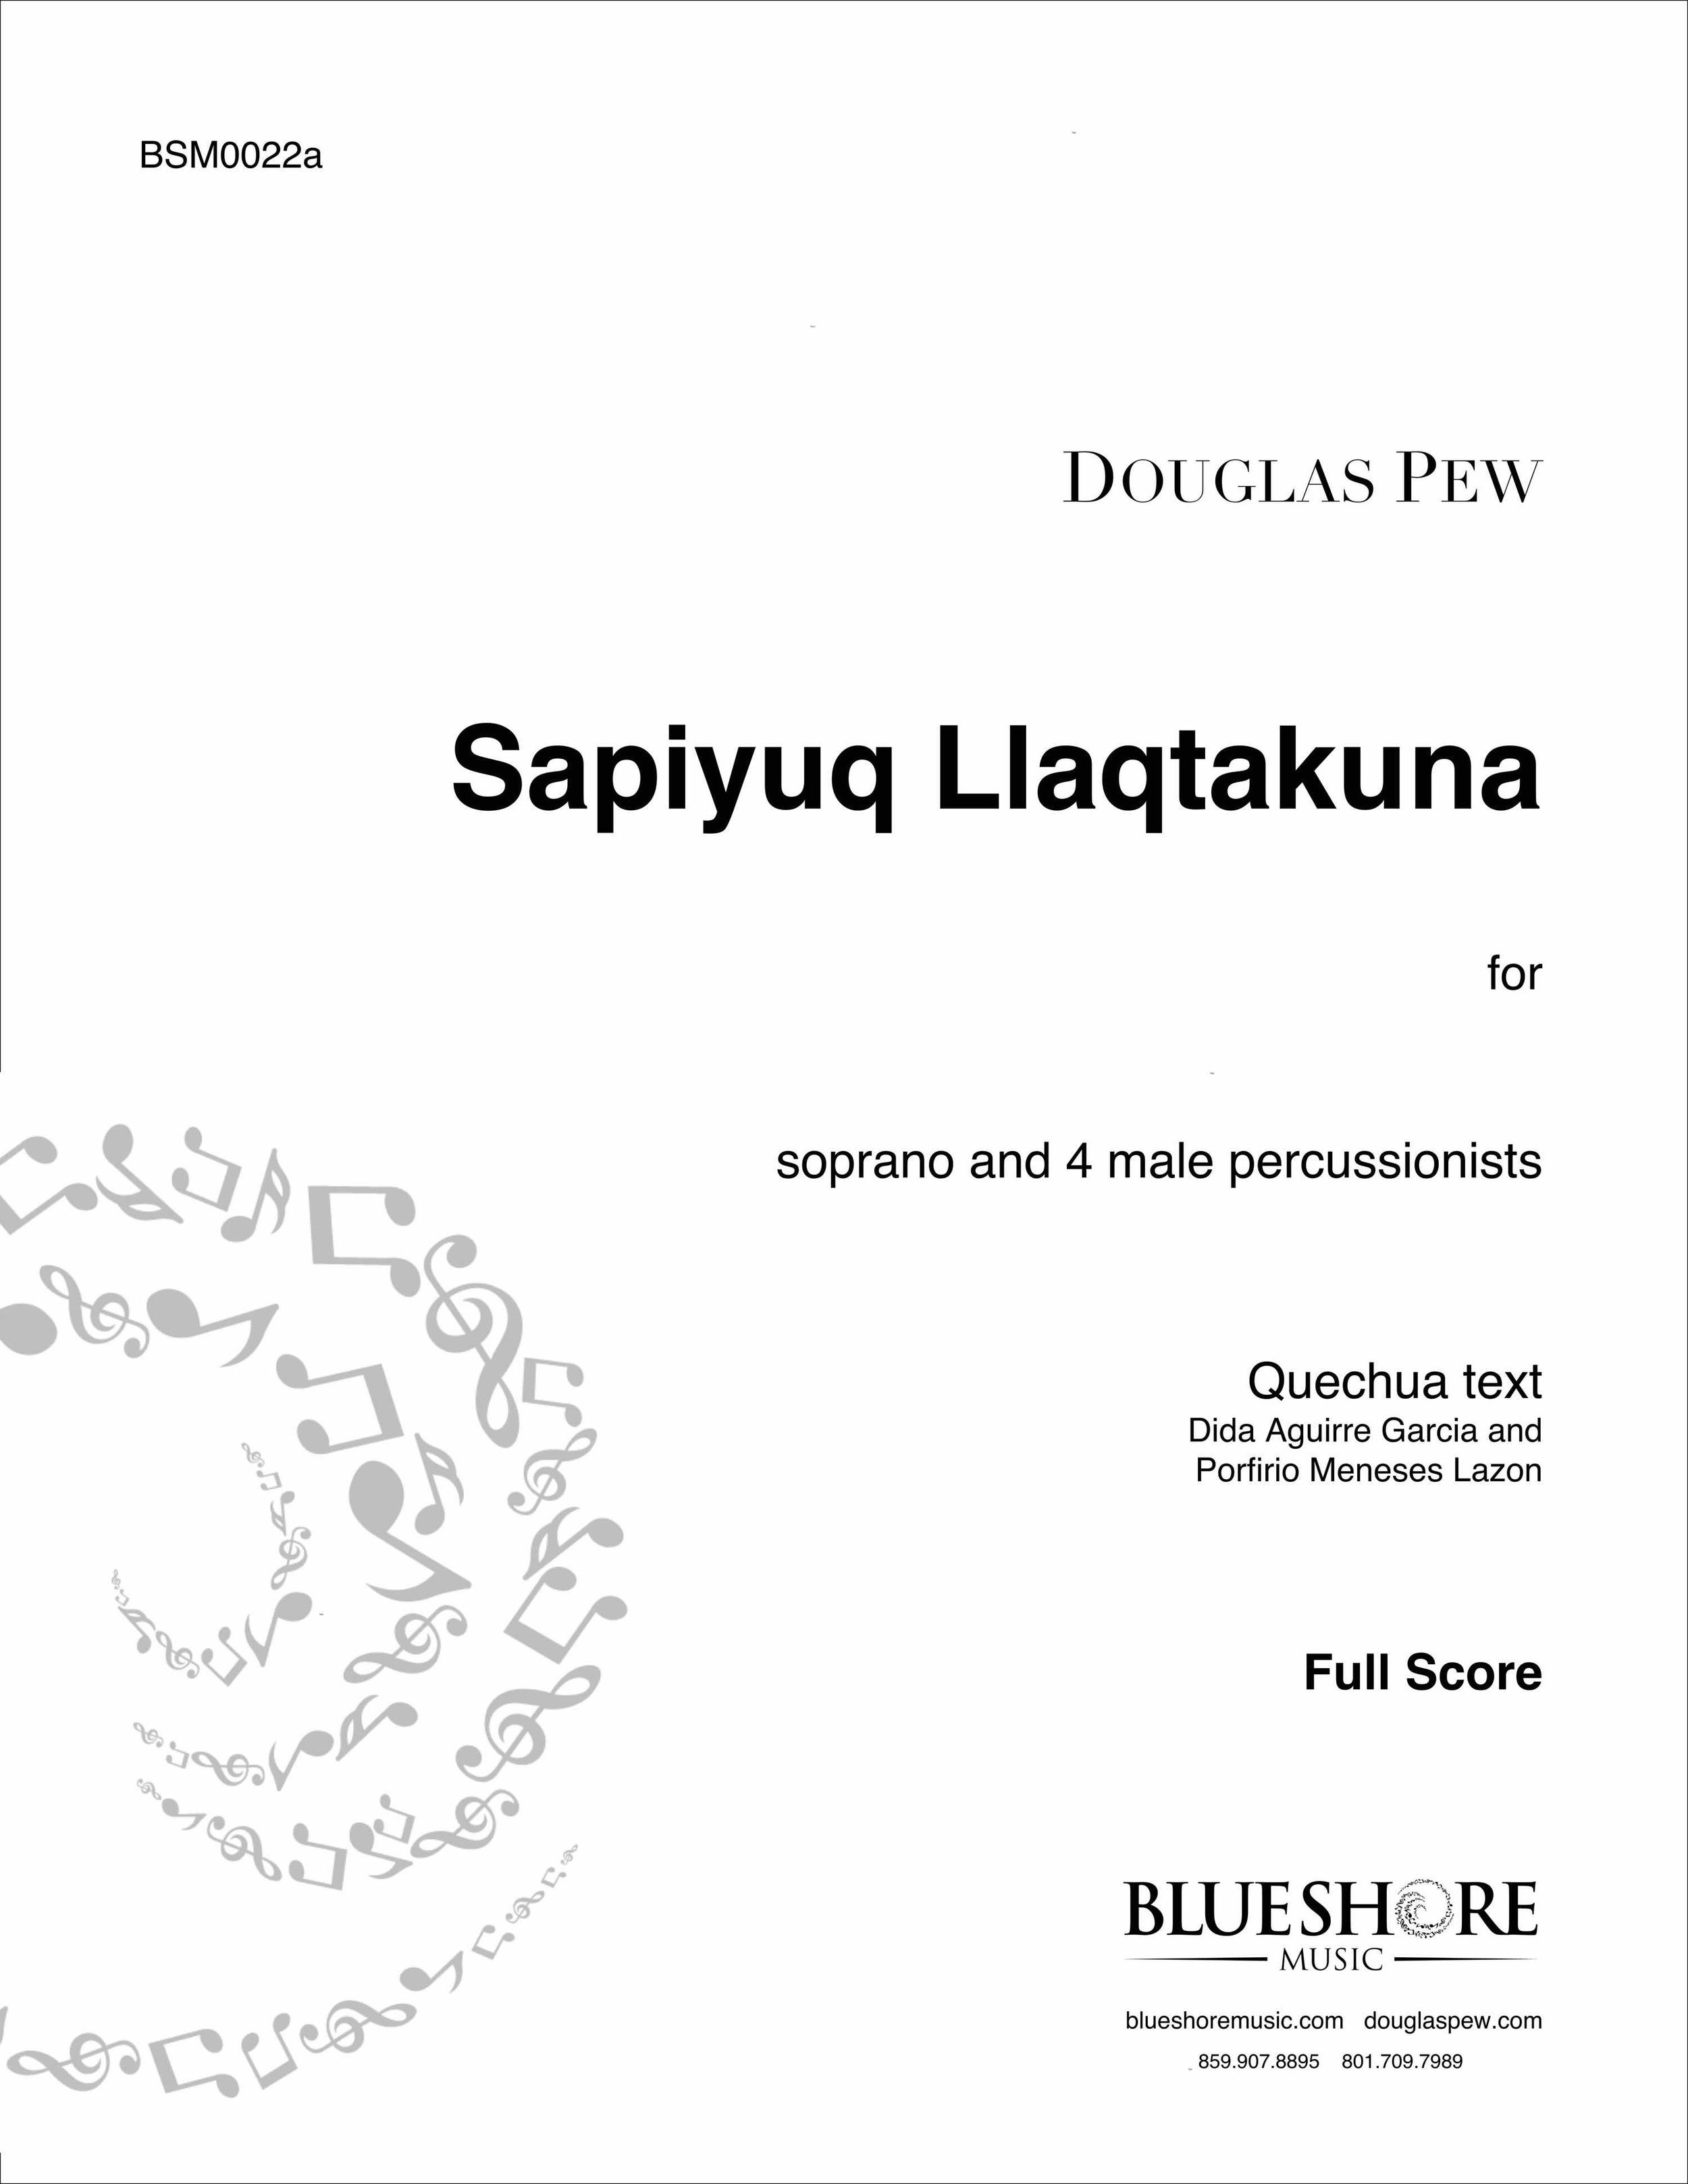 Sapiyuq Llaqtakuna, for Soprano and 4 Male Percussionists